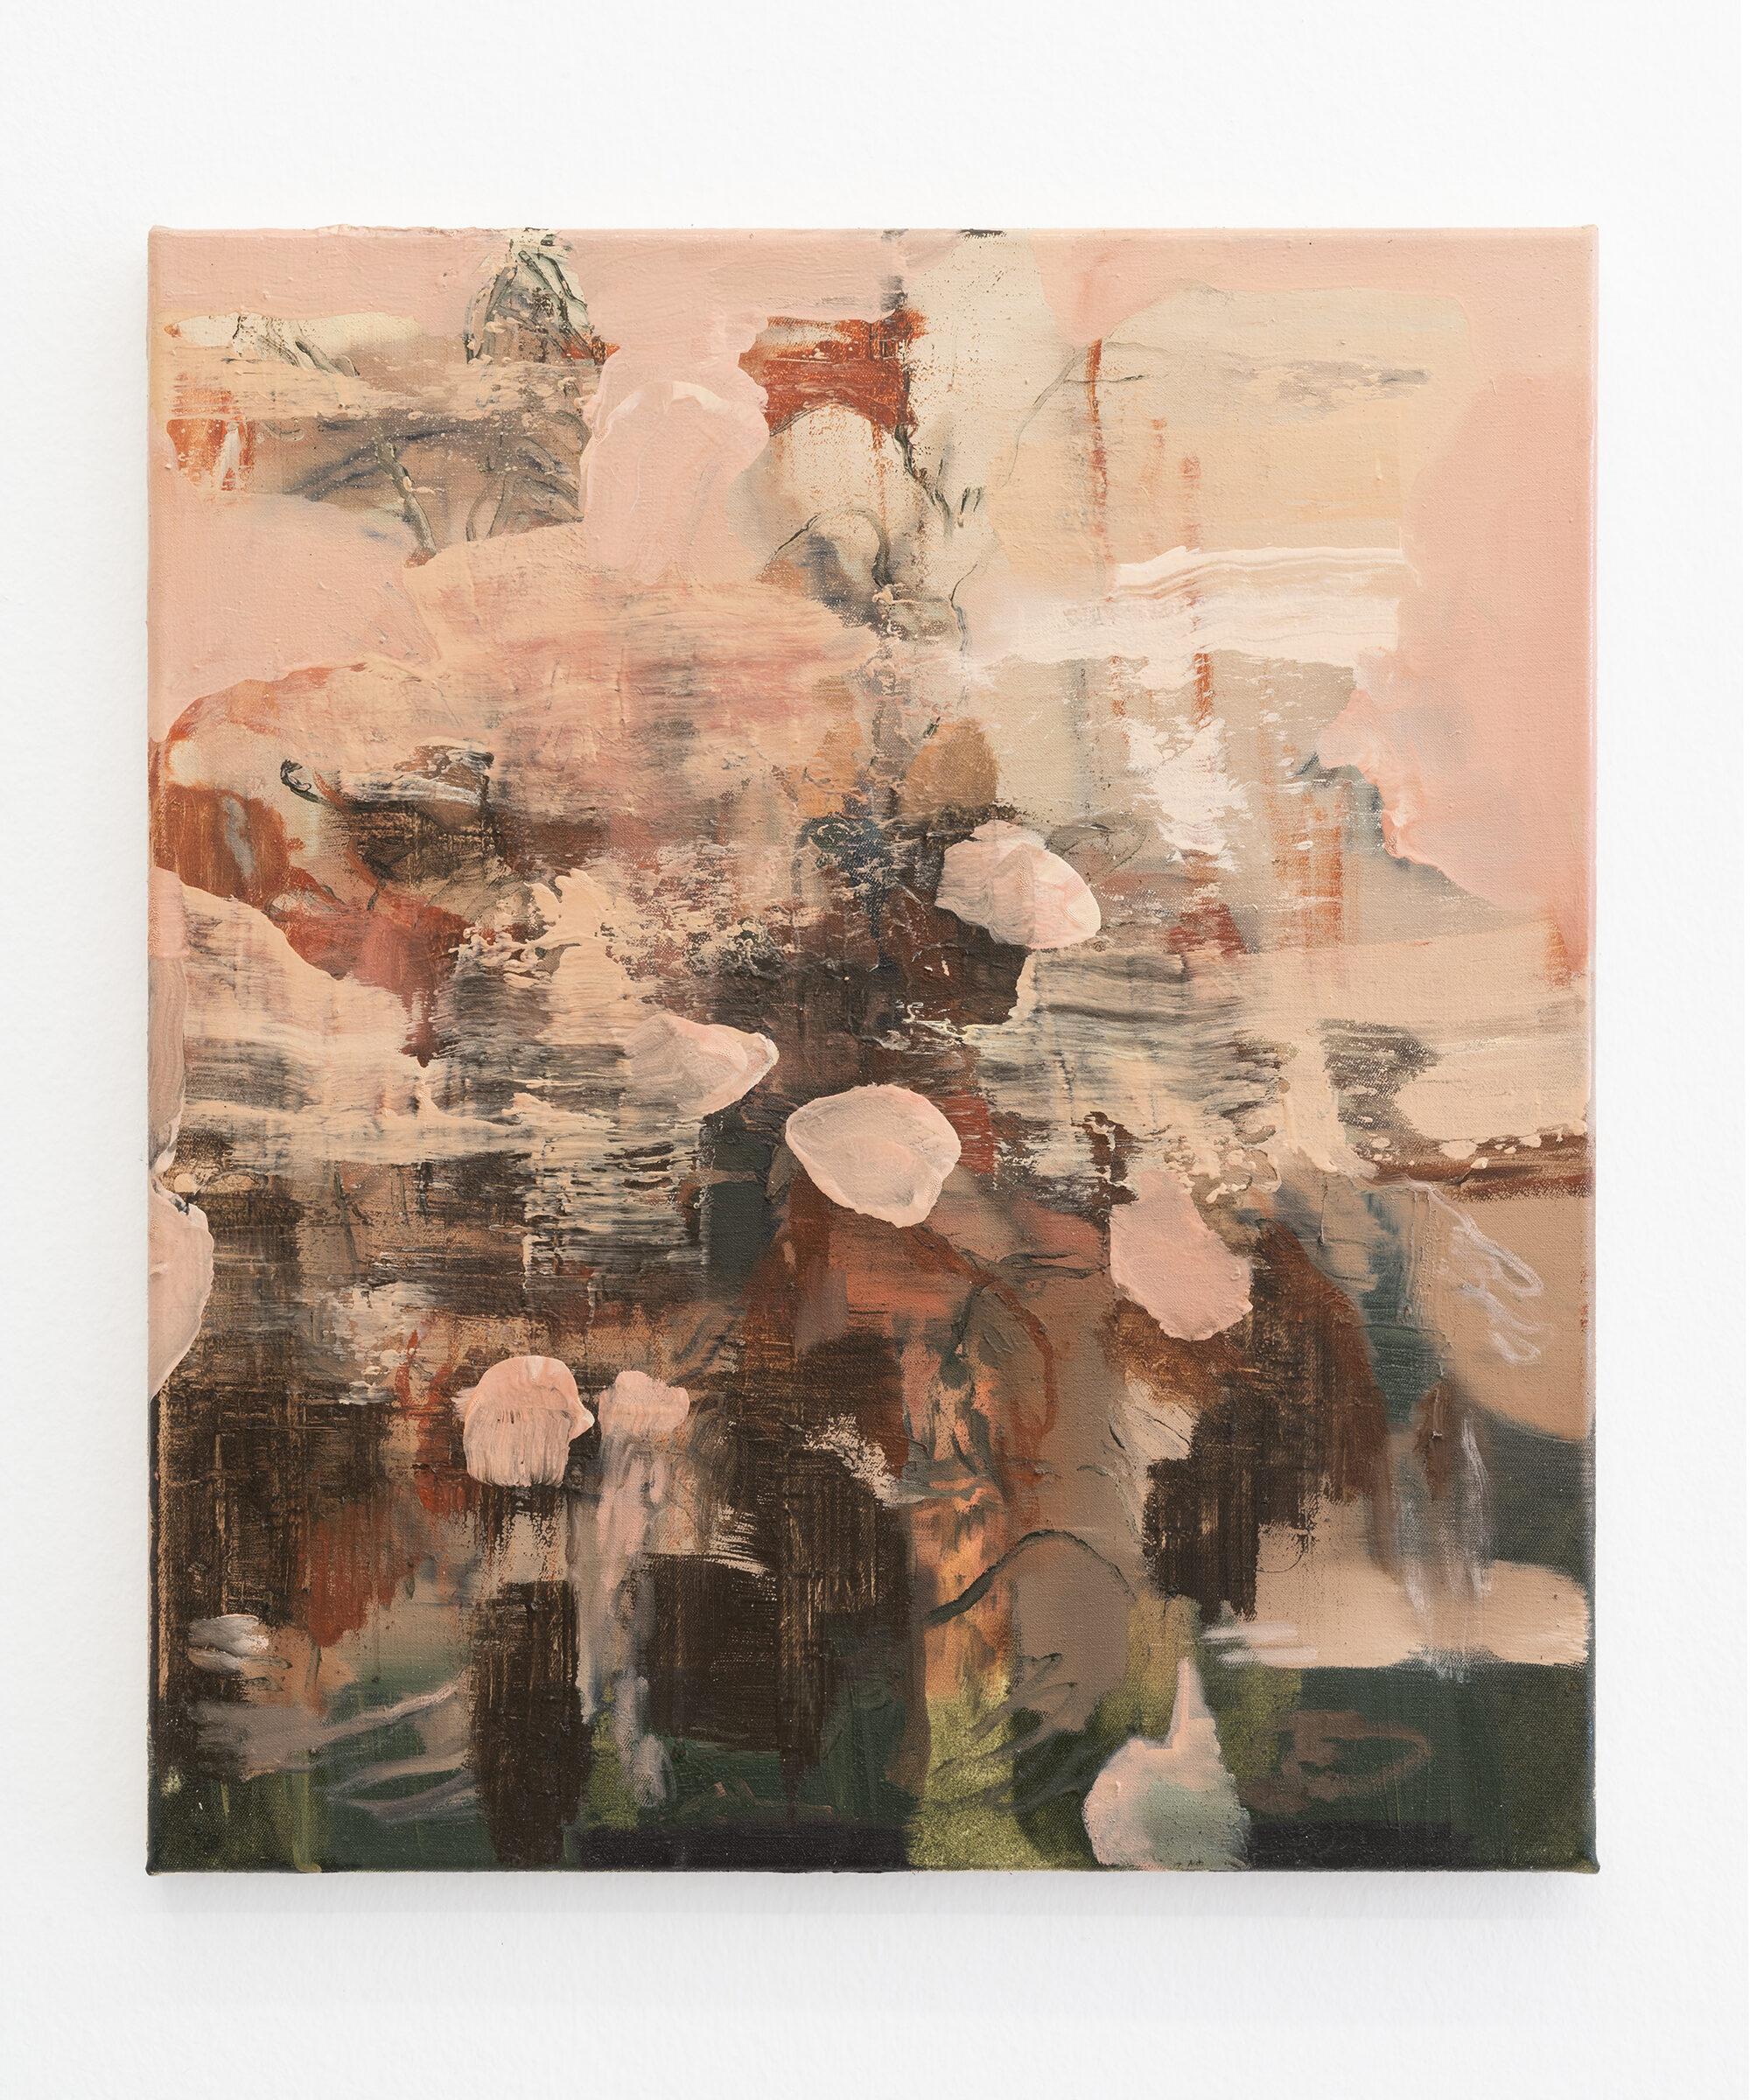 11. Nazzarena Poli Maramotti, Blumenstrauss, mixed media on canvas, 45x40cm, 2018